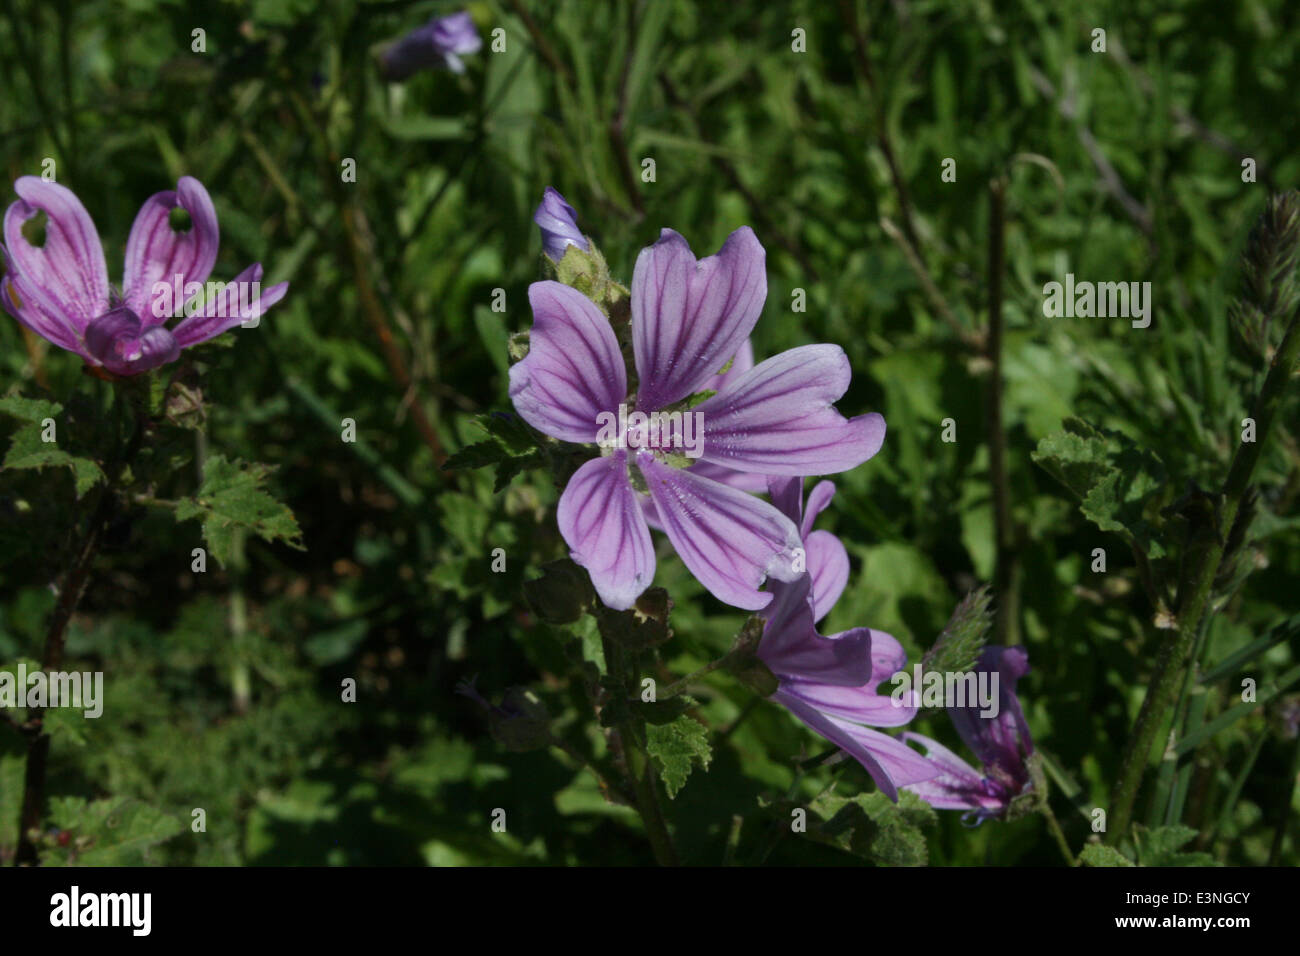 Blüte violett - Stock Image